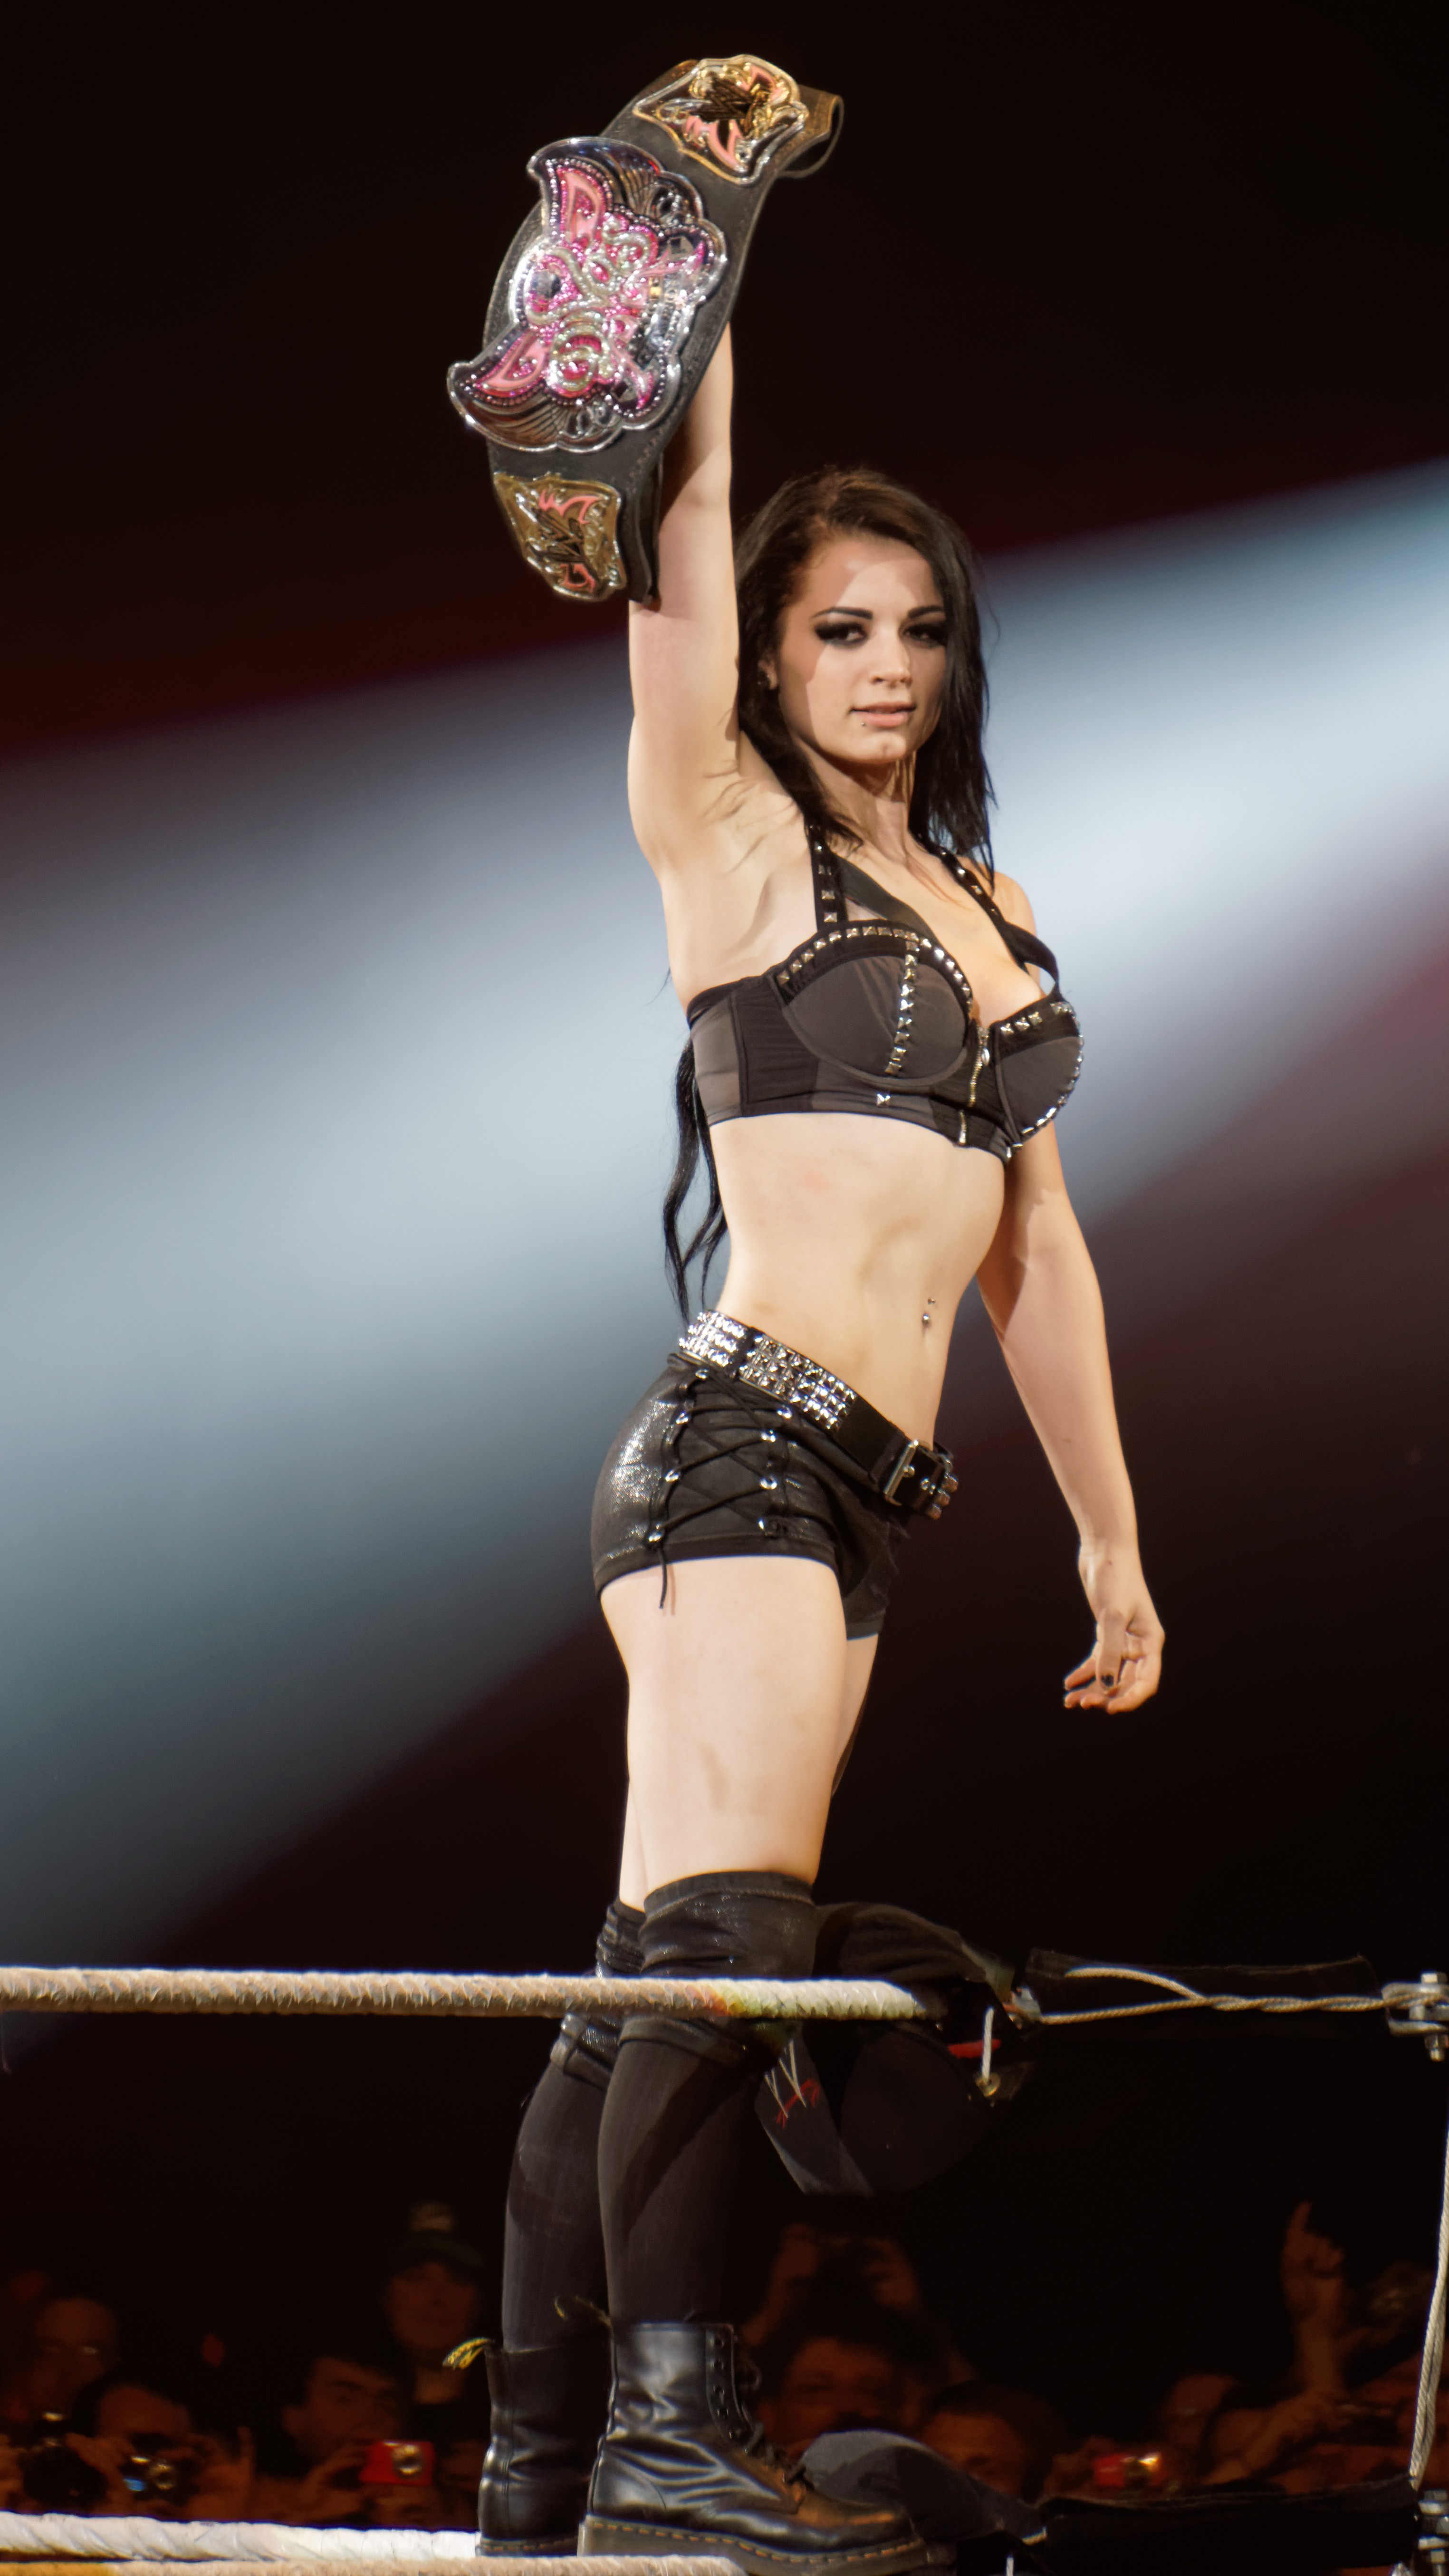 Paige - WWE